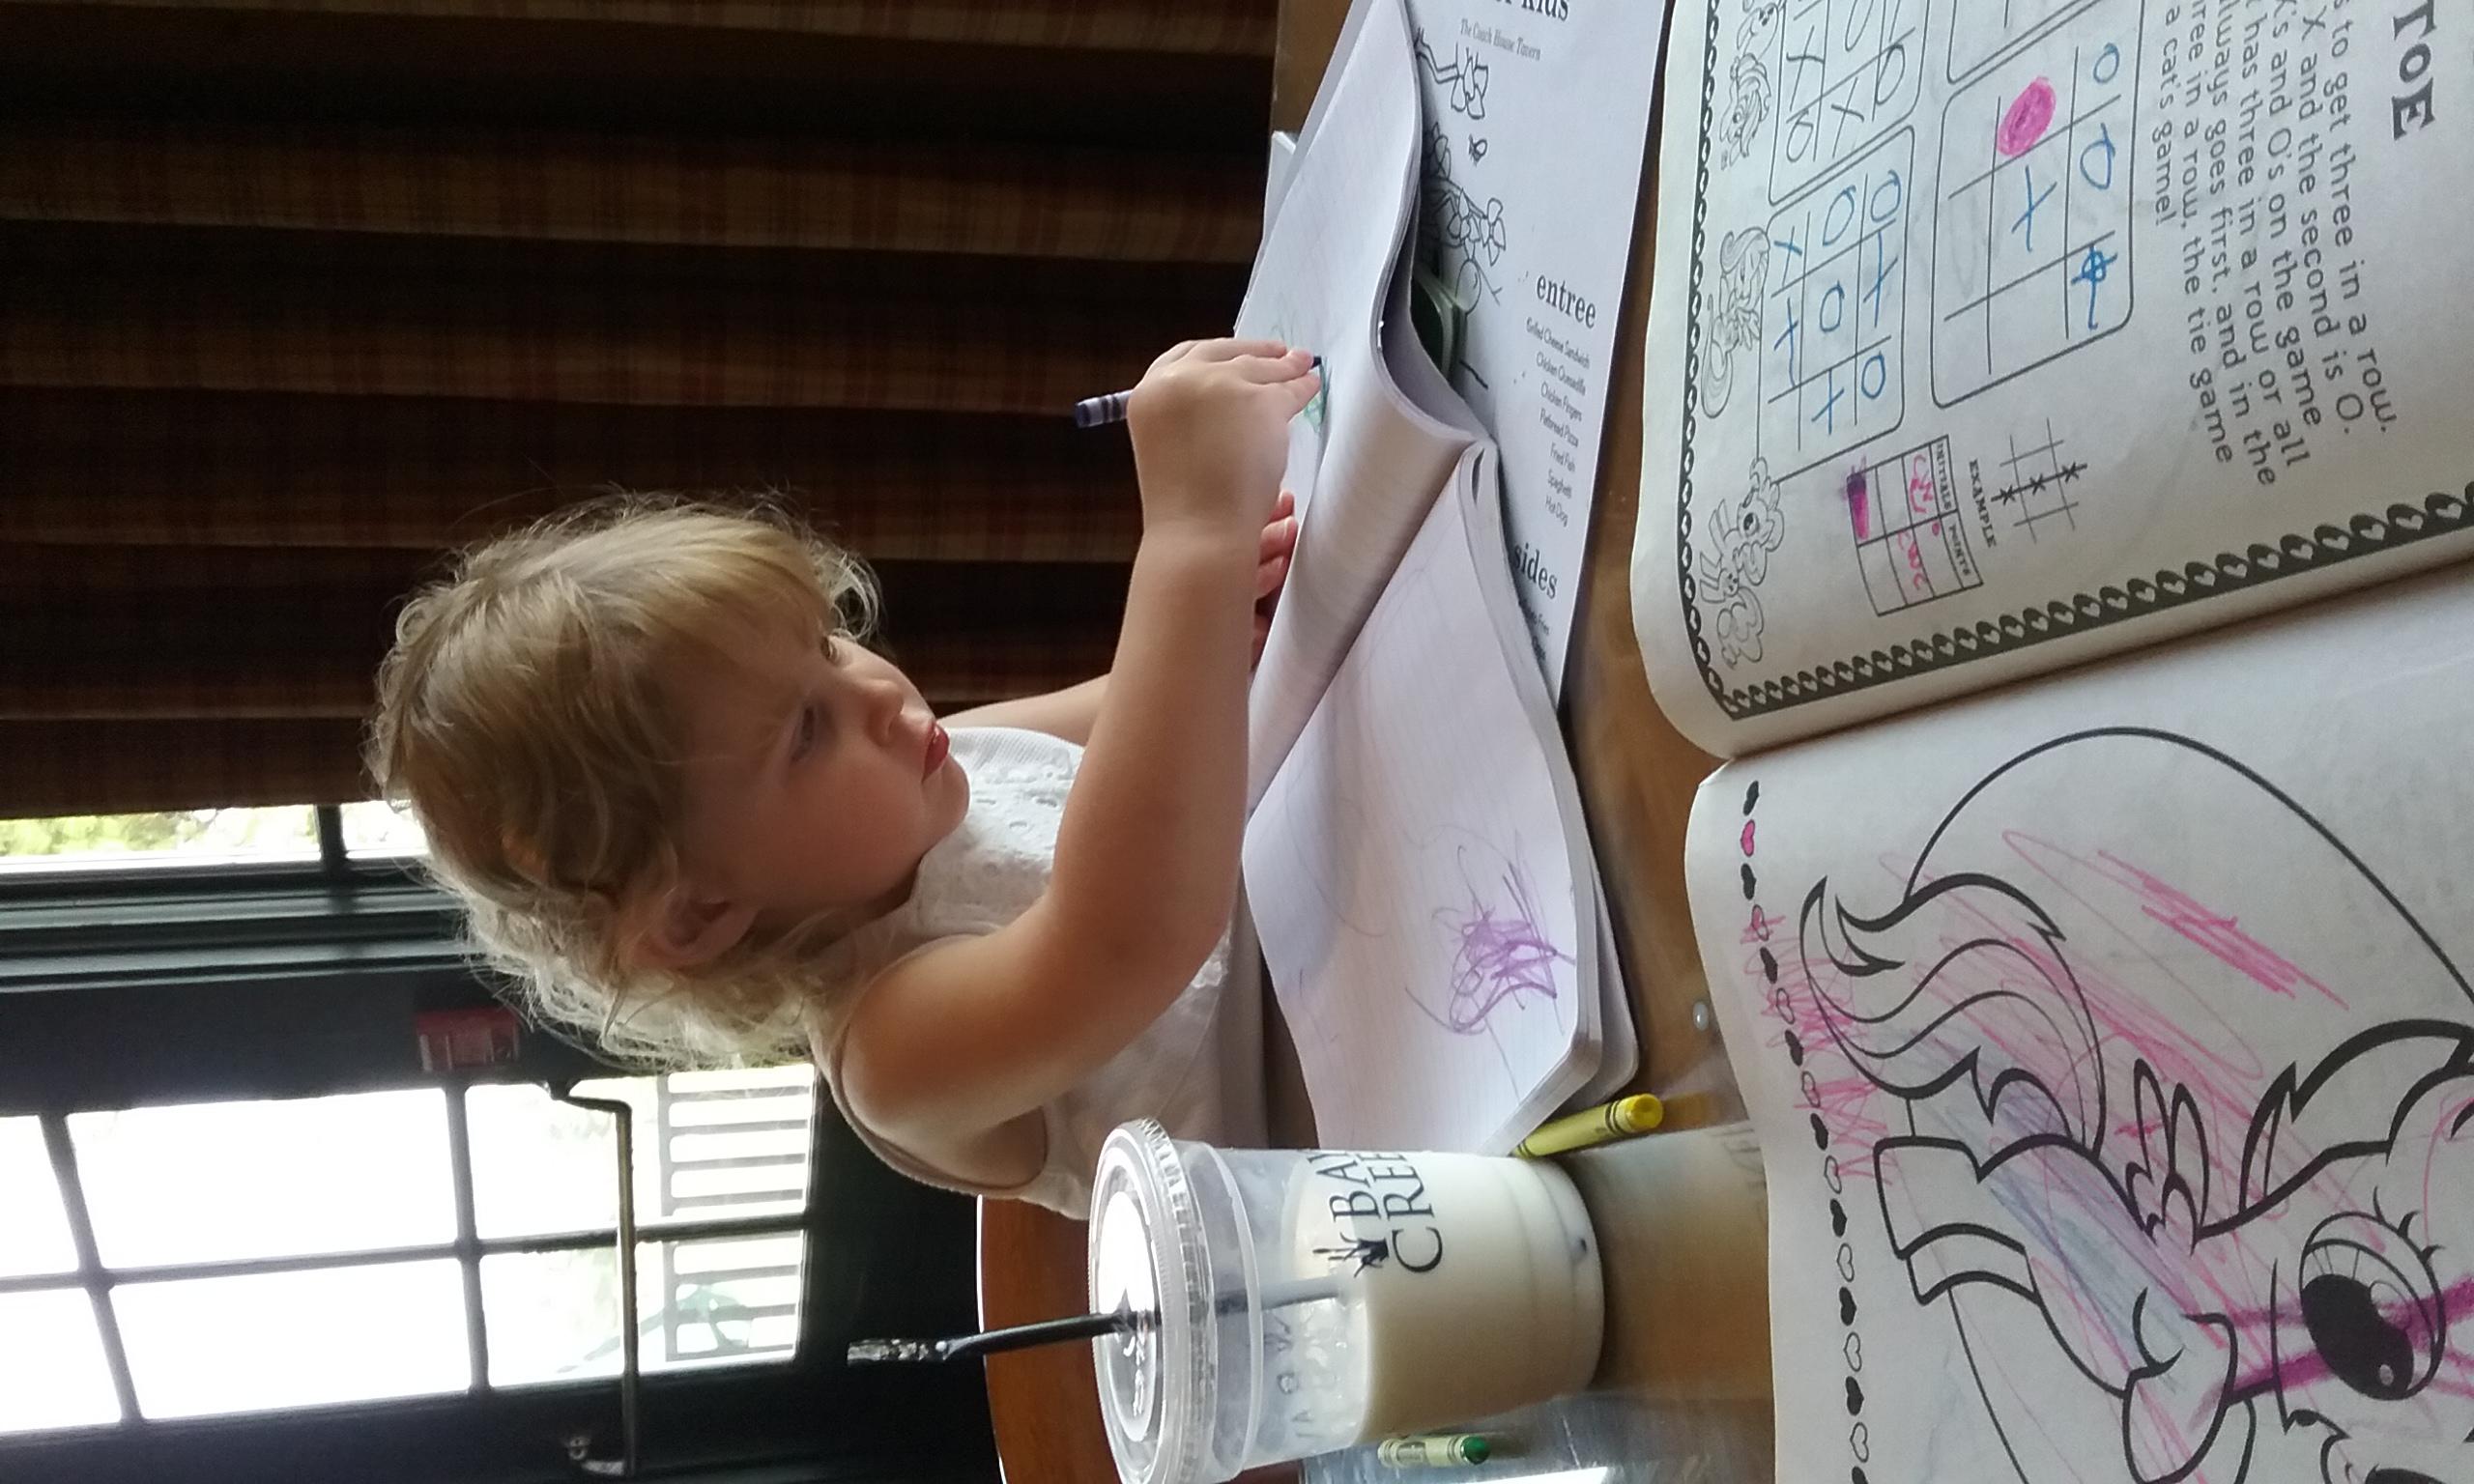 Restaurant fun: notebook & crayons